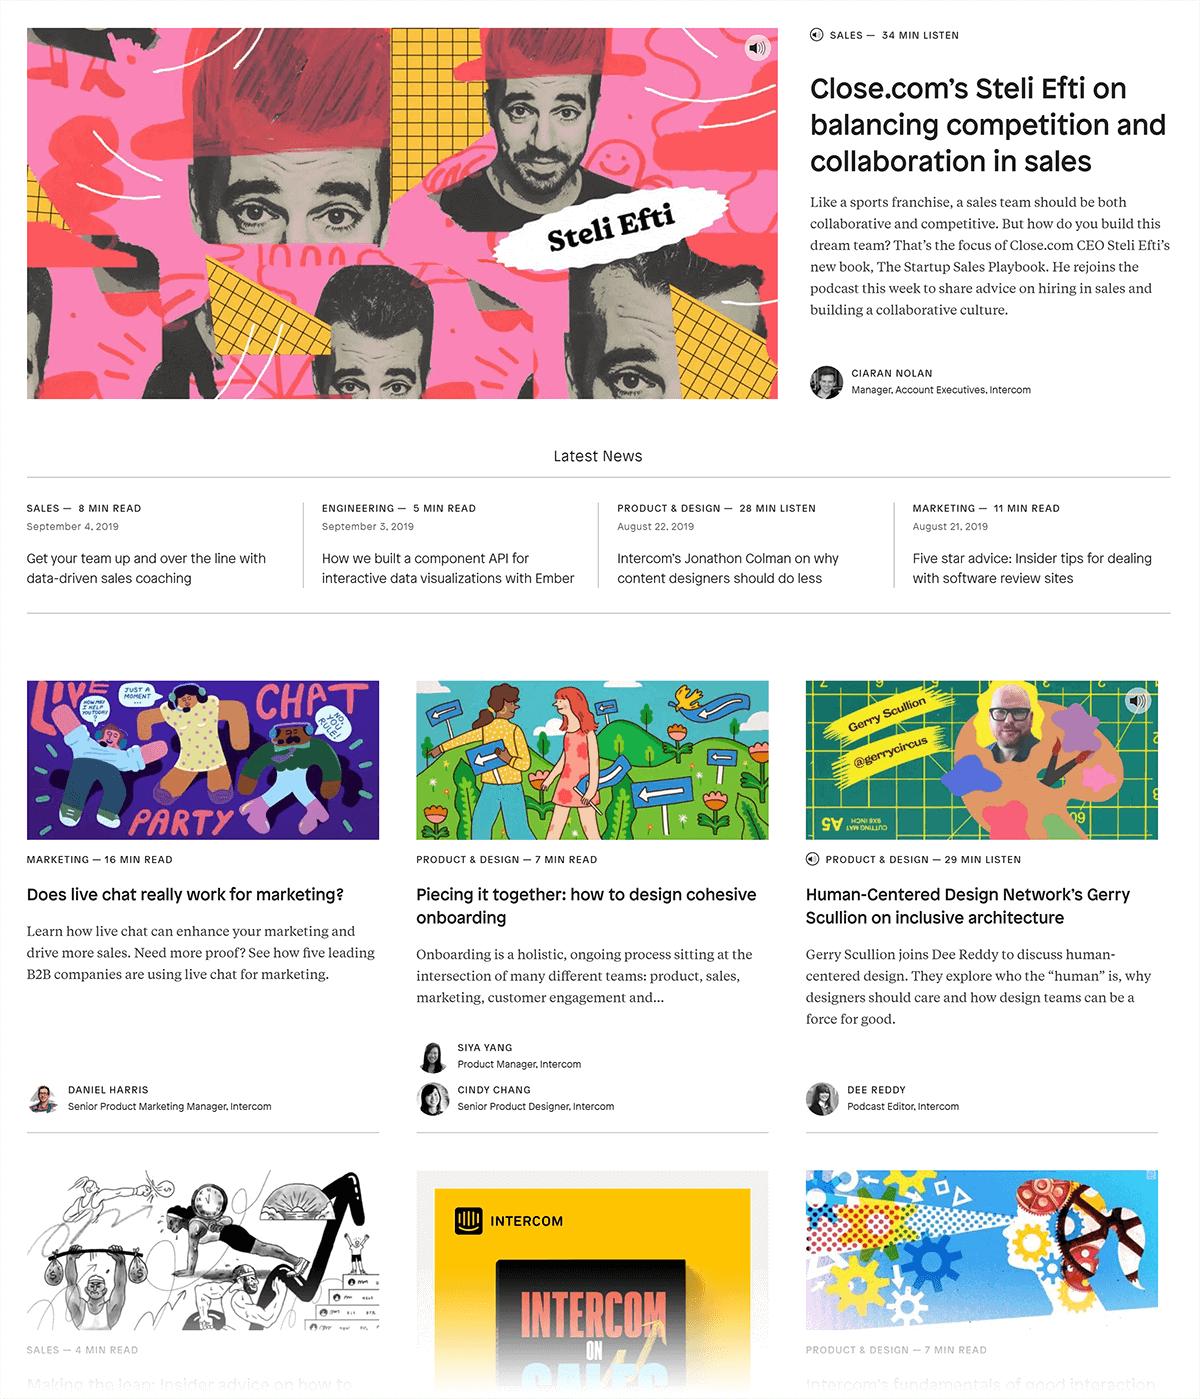 Intercom blog layout